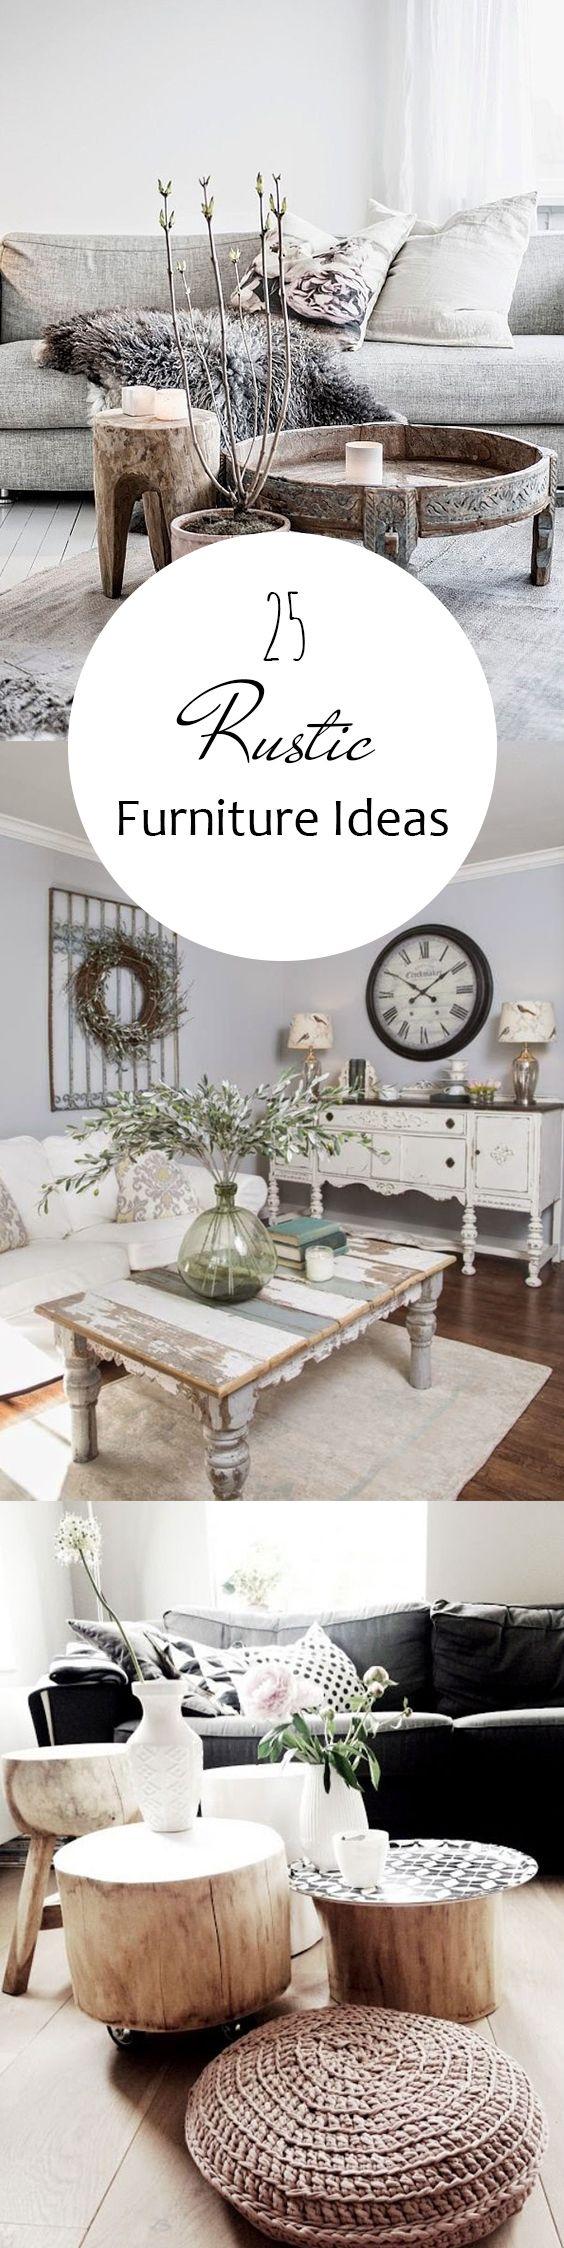 Rustic Furniture Rustic Home Decor DIY Home